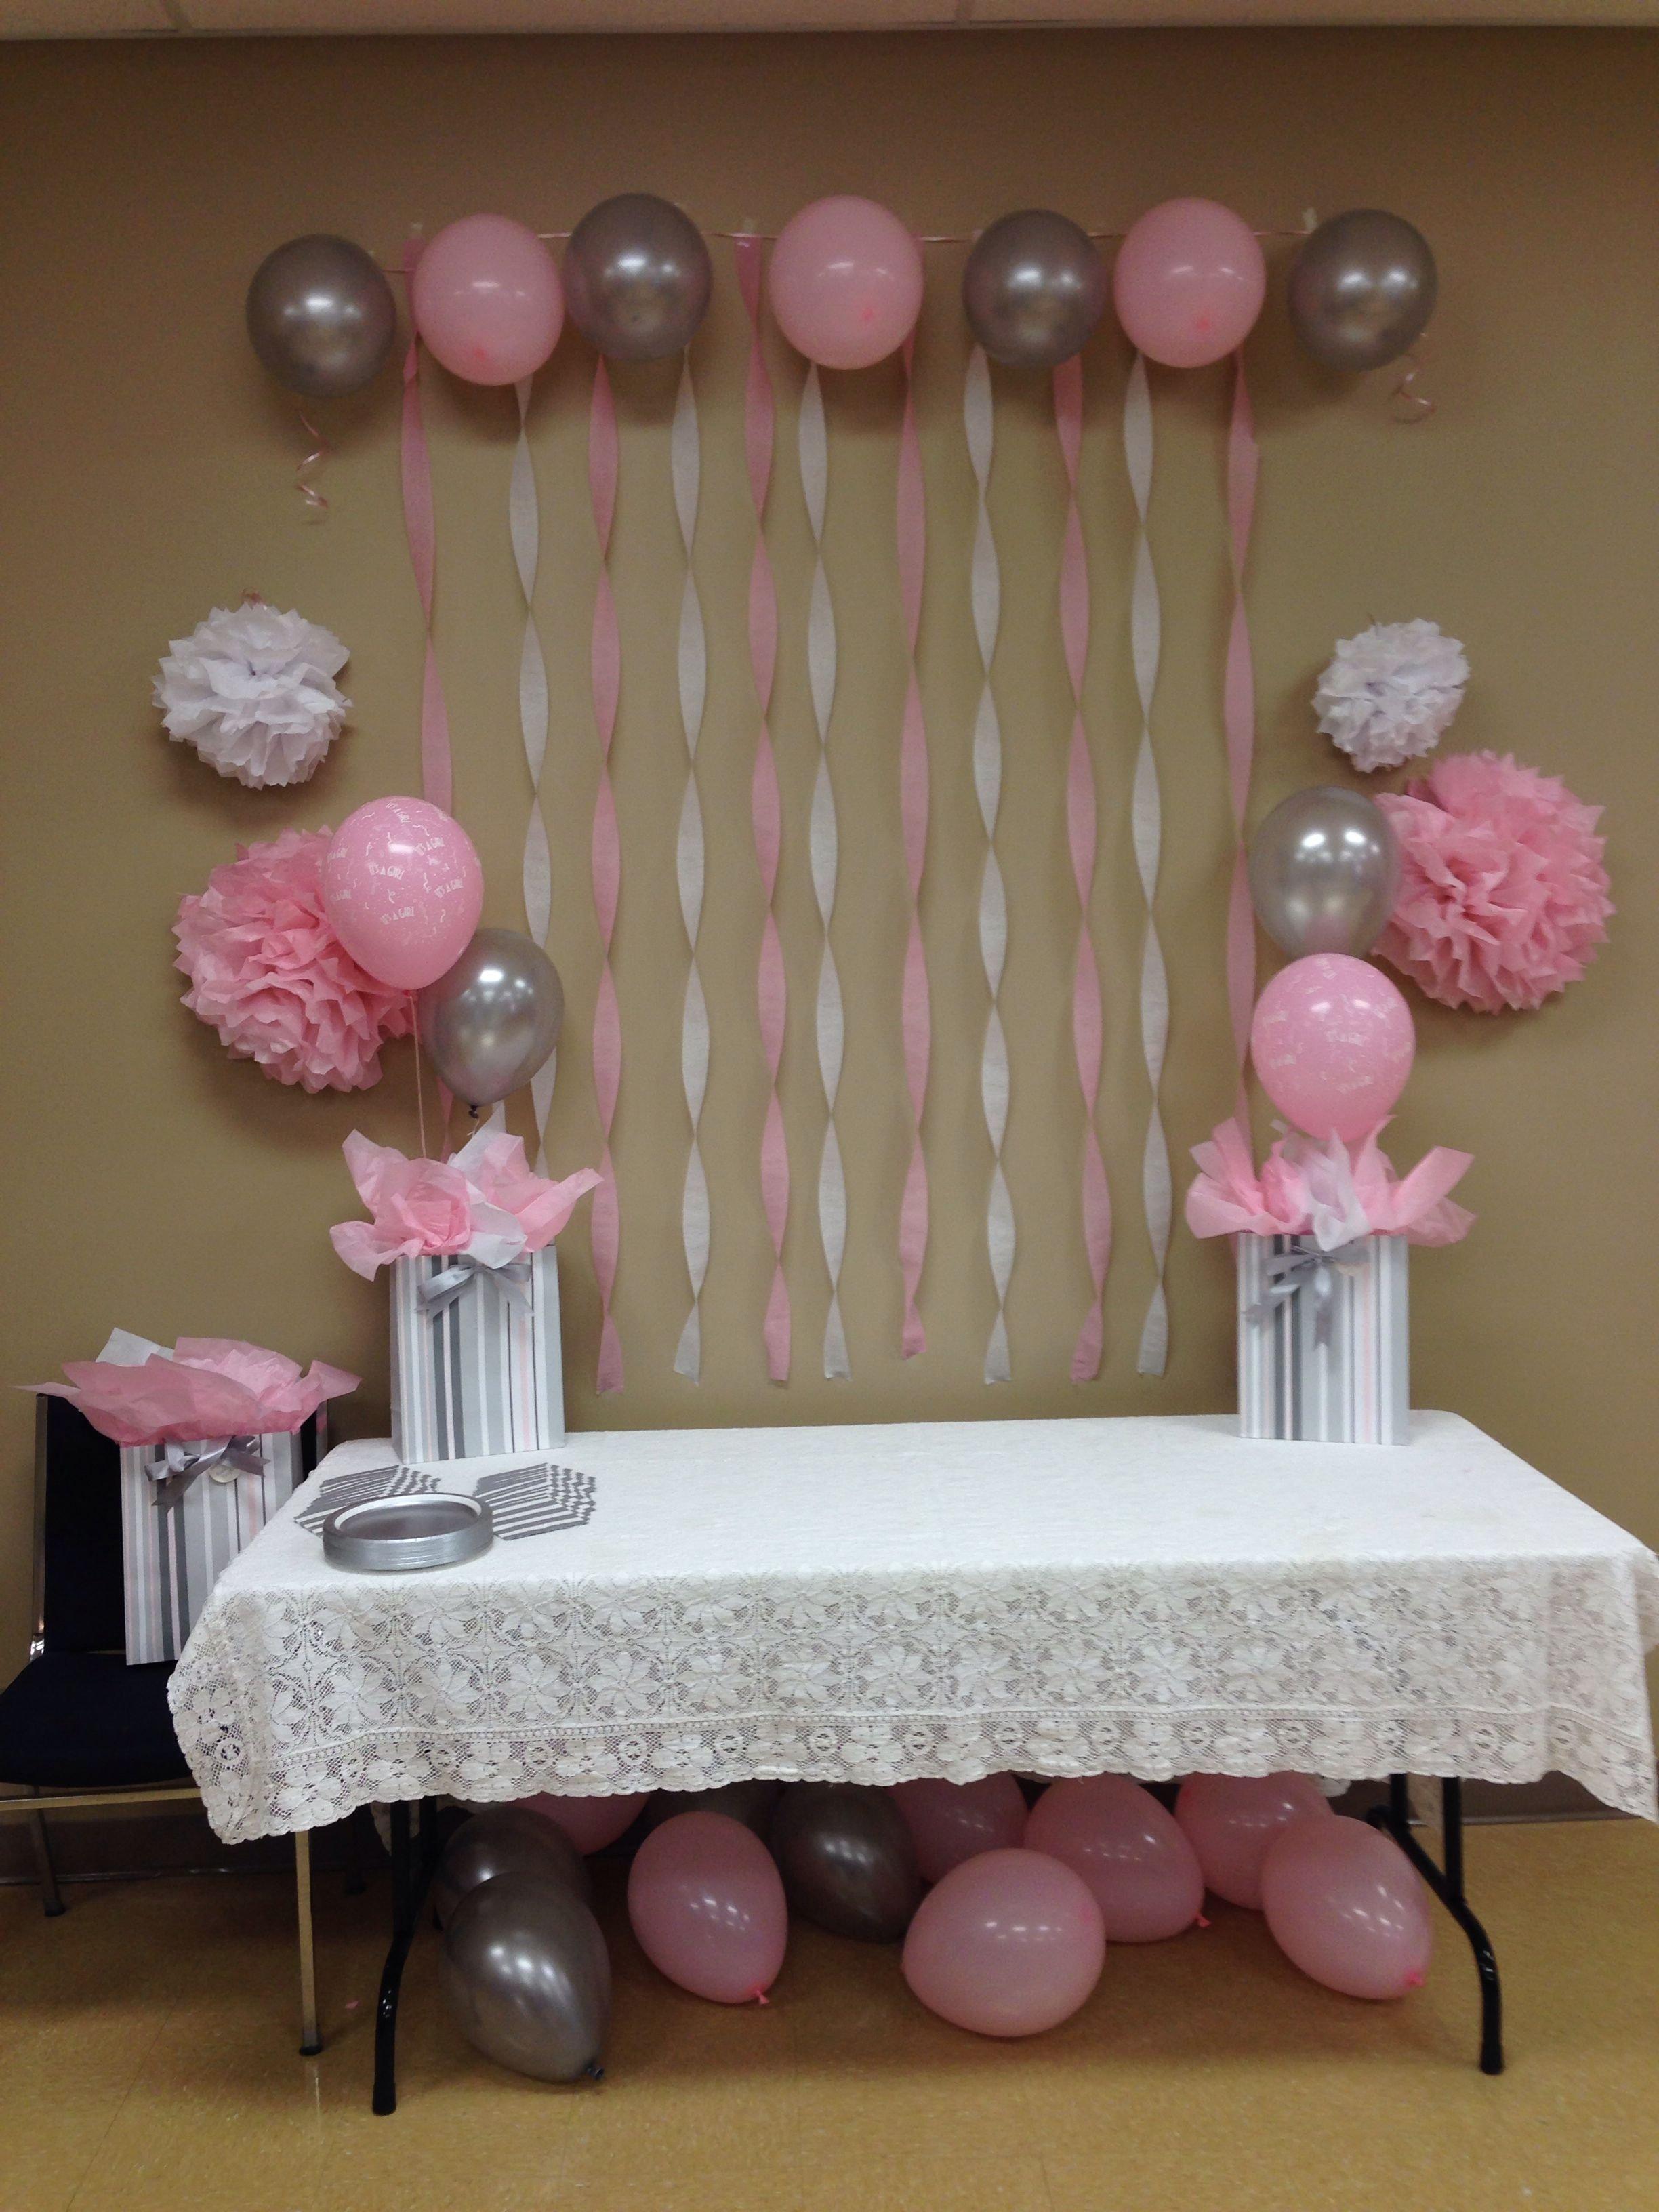 10 Fashionable Baby Girl Baby Shower Ideas light pink grey white baby shower baby shower ideas for girls 2020